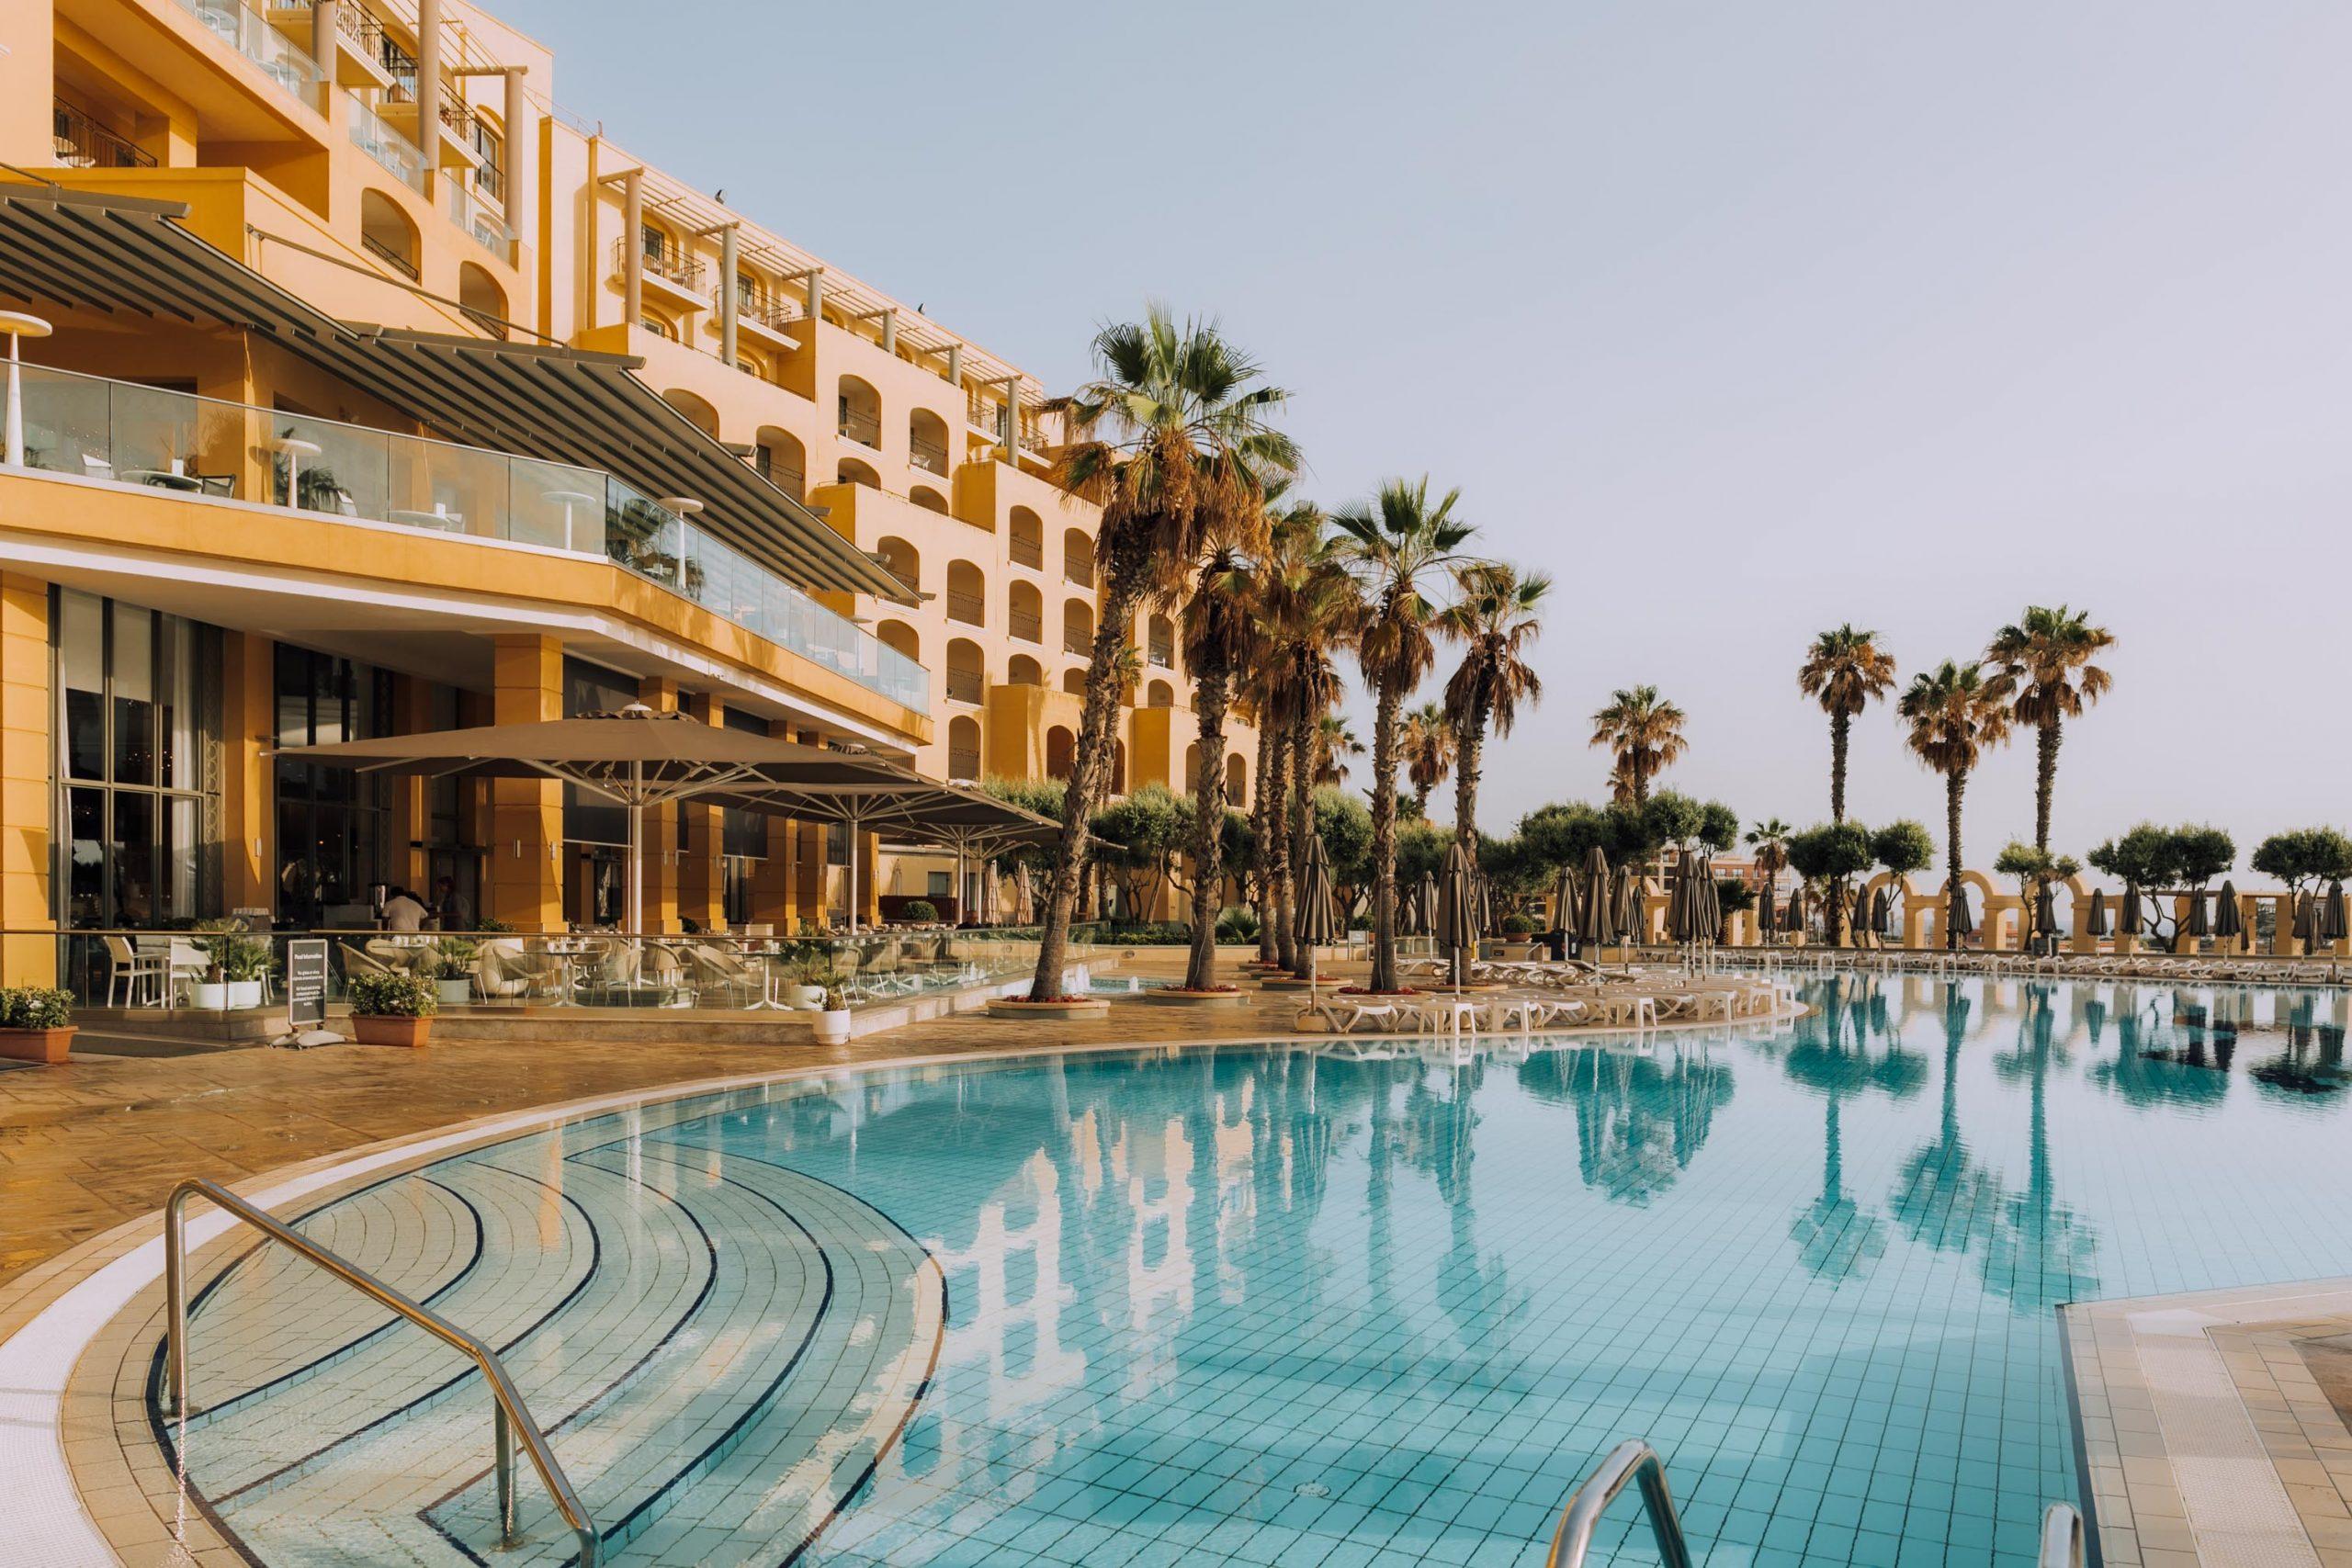 luxury hotel review hilton hilton goodcitizen6 scaled